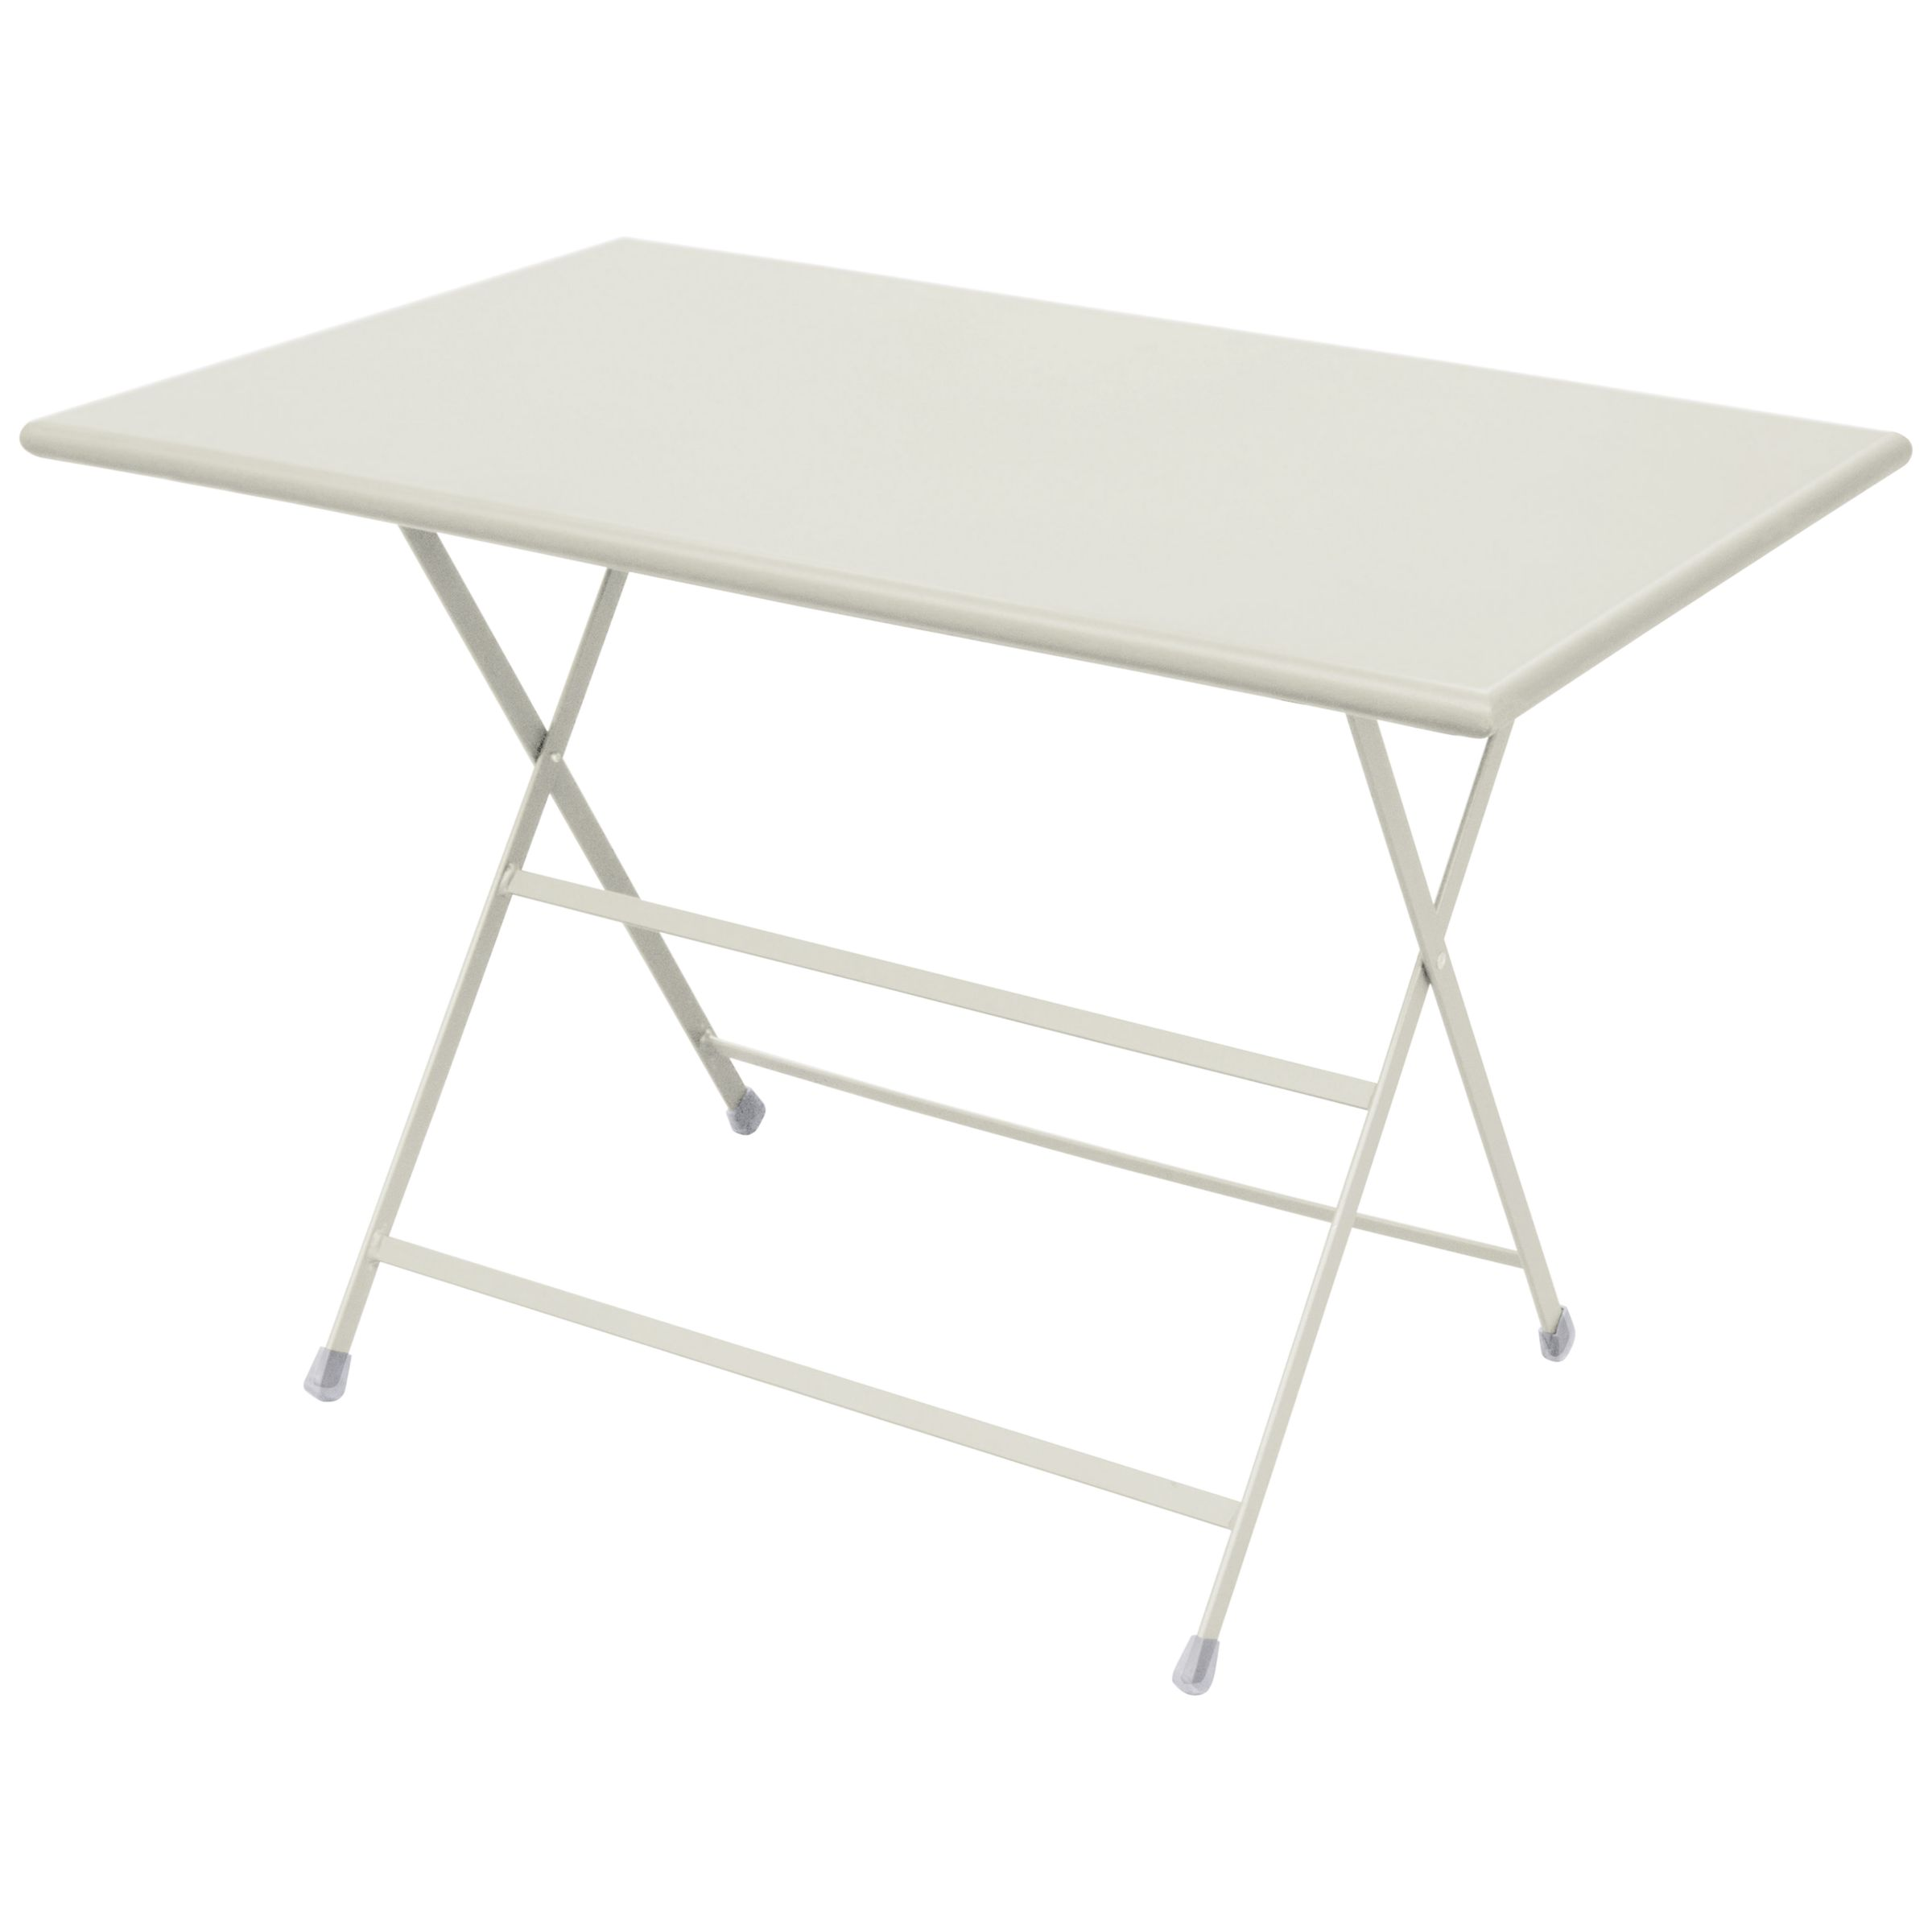 EMU Arc En Ciel Rectangular 4 Seater Outdoor Dining Table, Cream